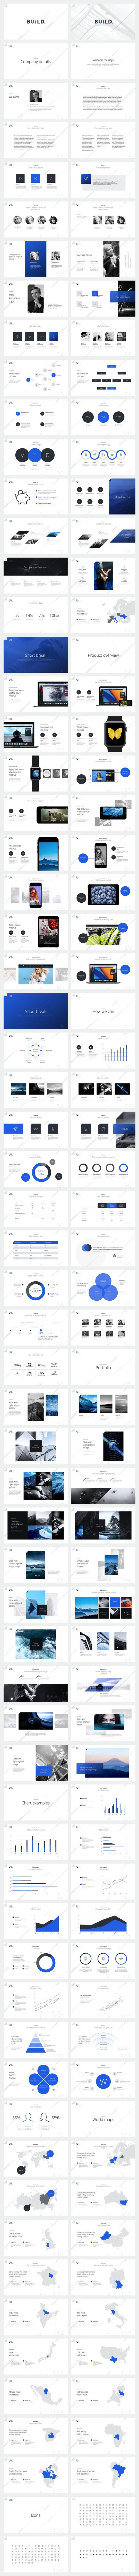 BUILD Keynote Presentation Template by ReworkMedia on @creativemarket